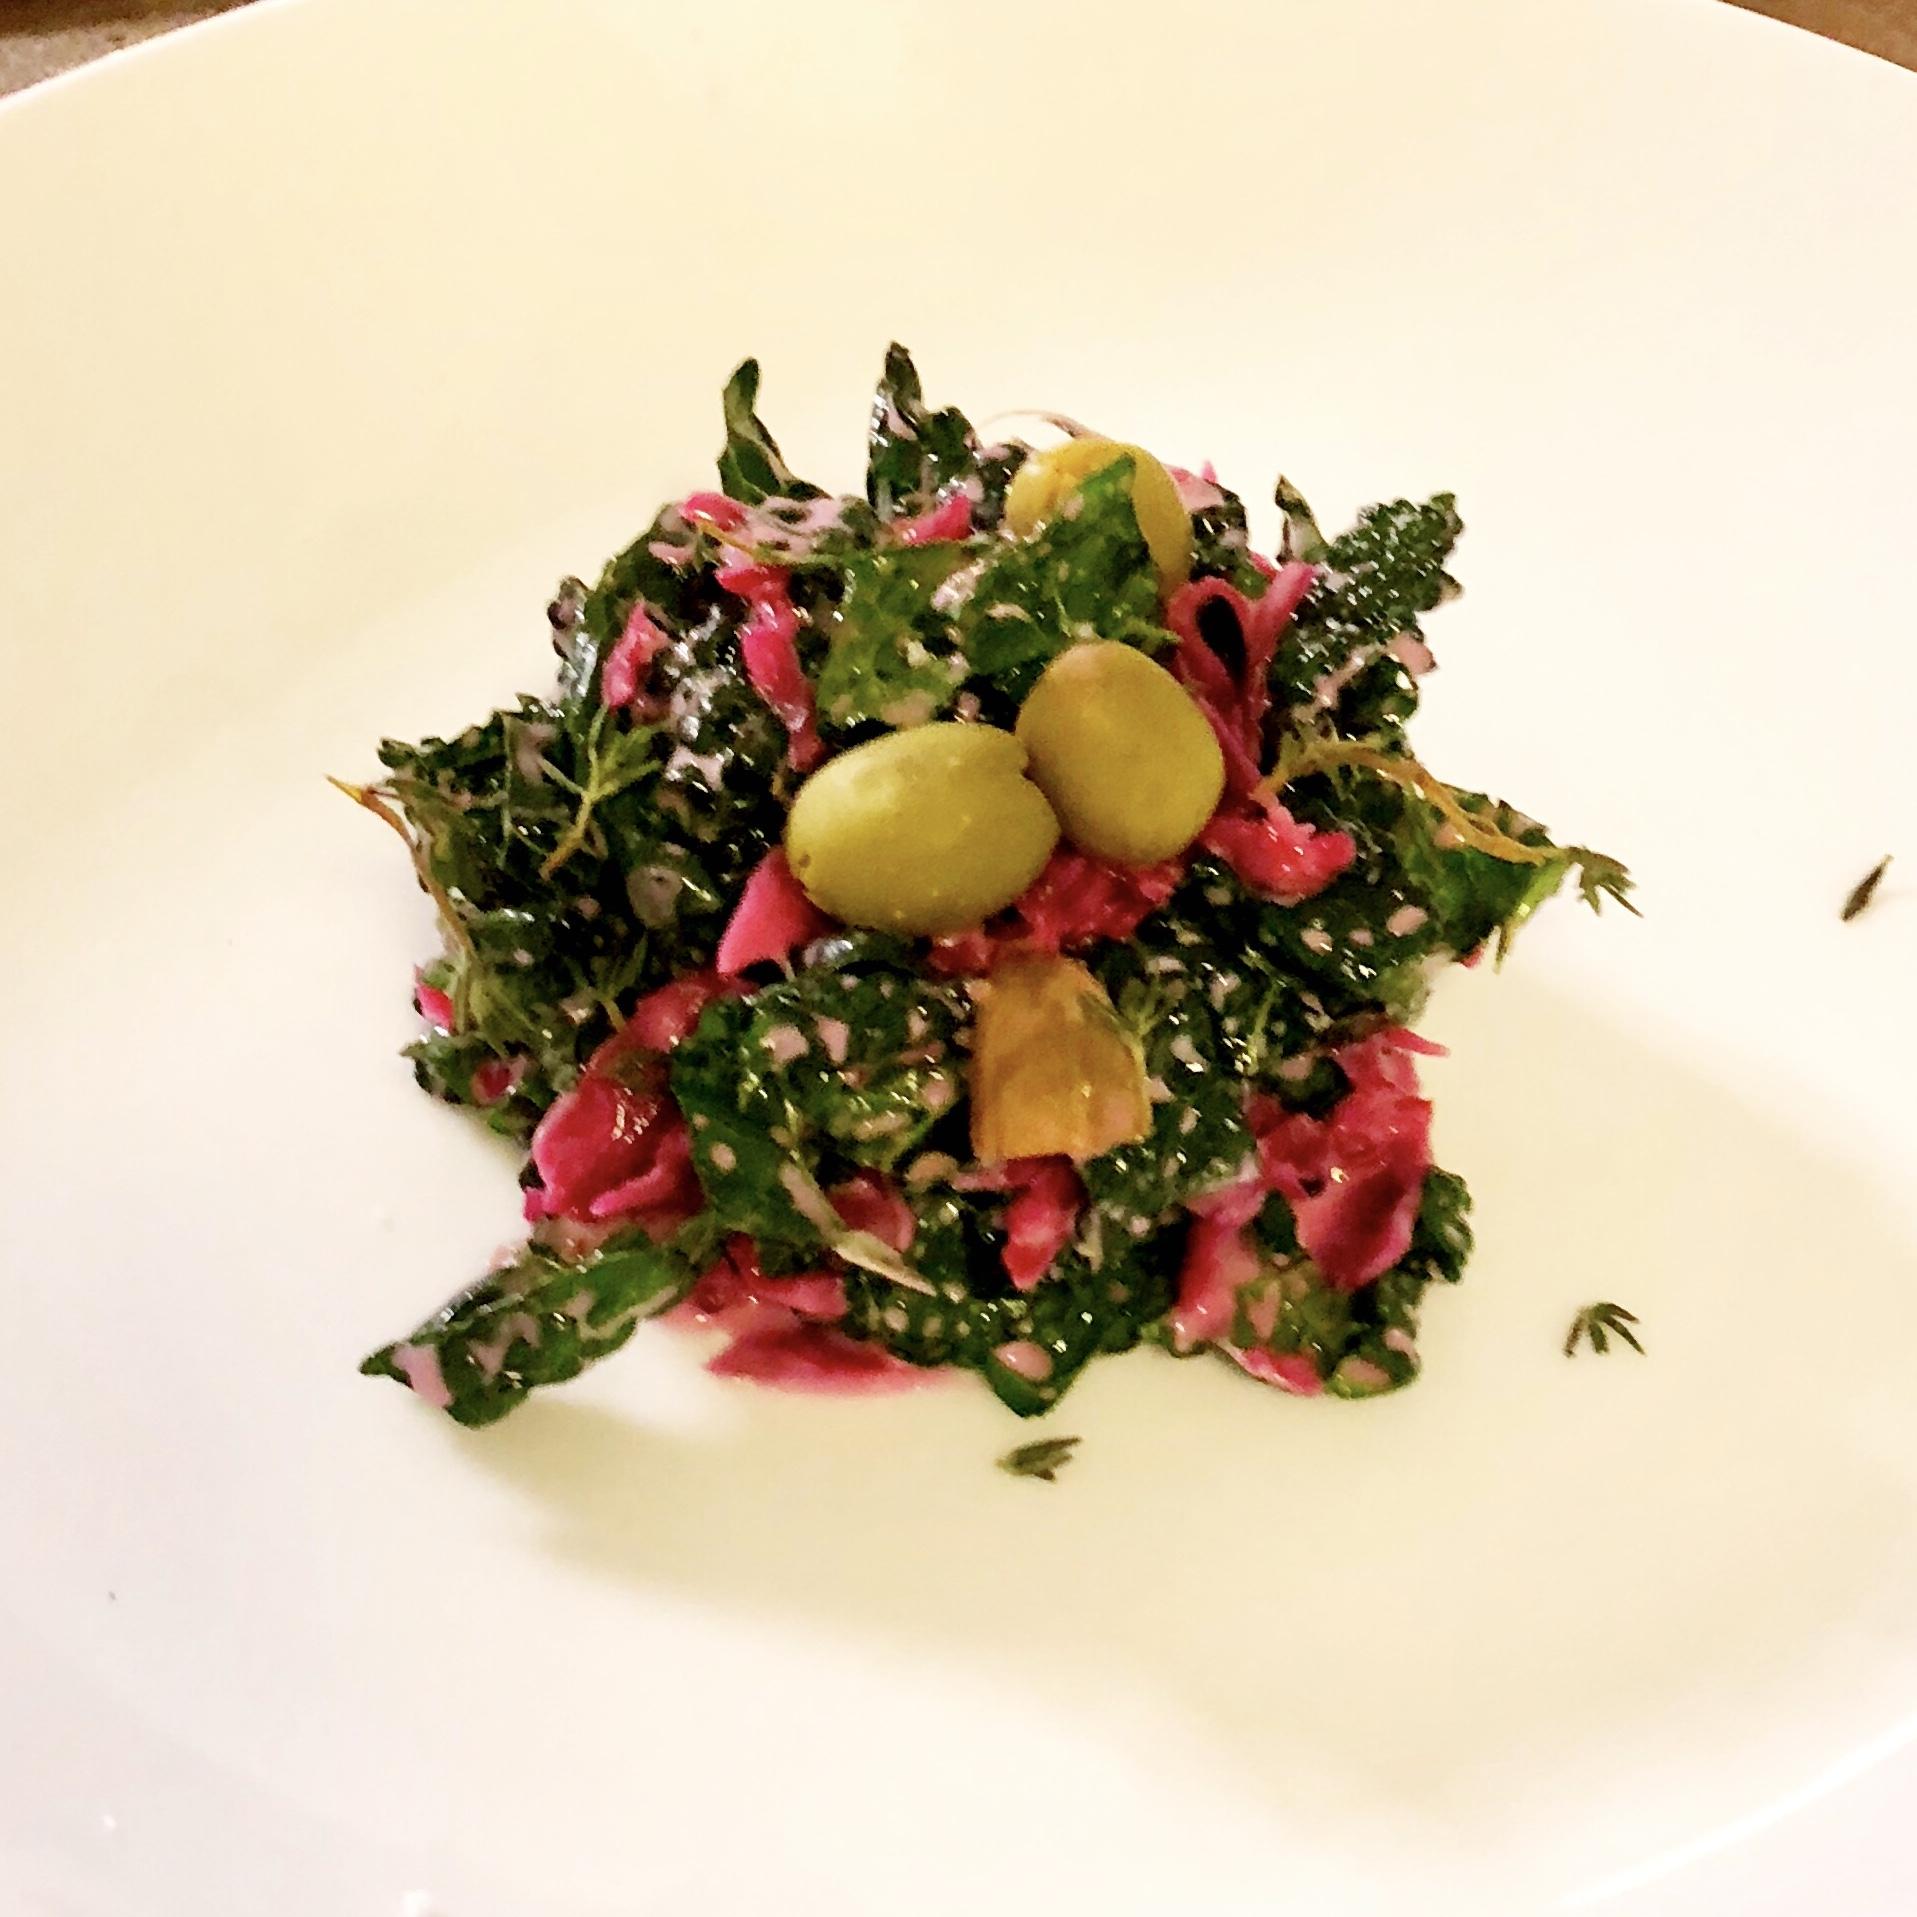 Purple Sauerkraut and Kale Salad